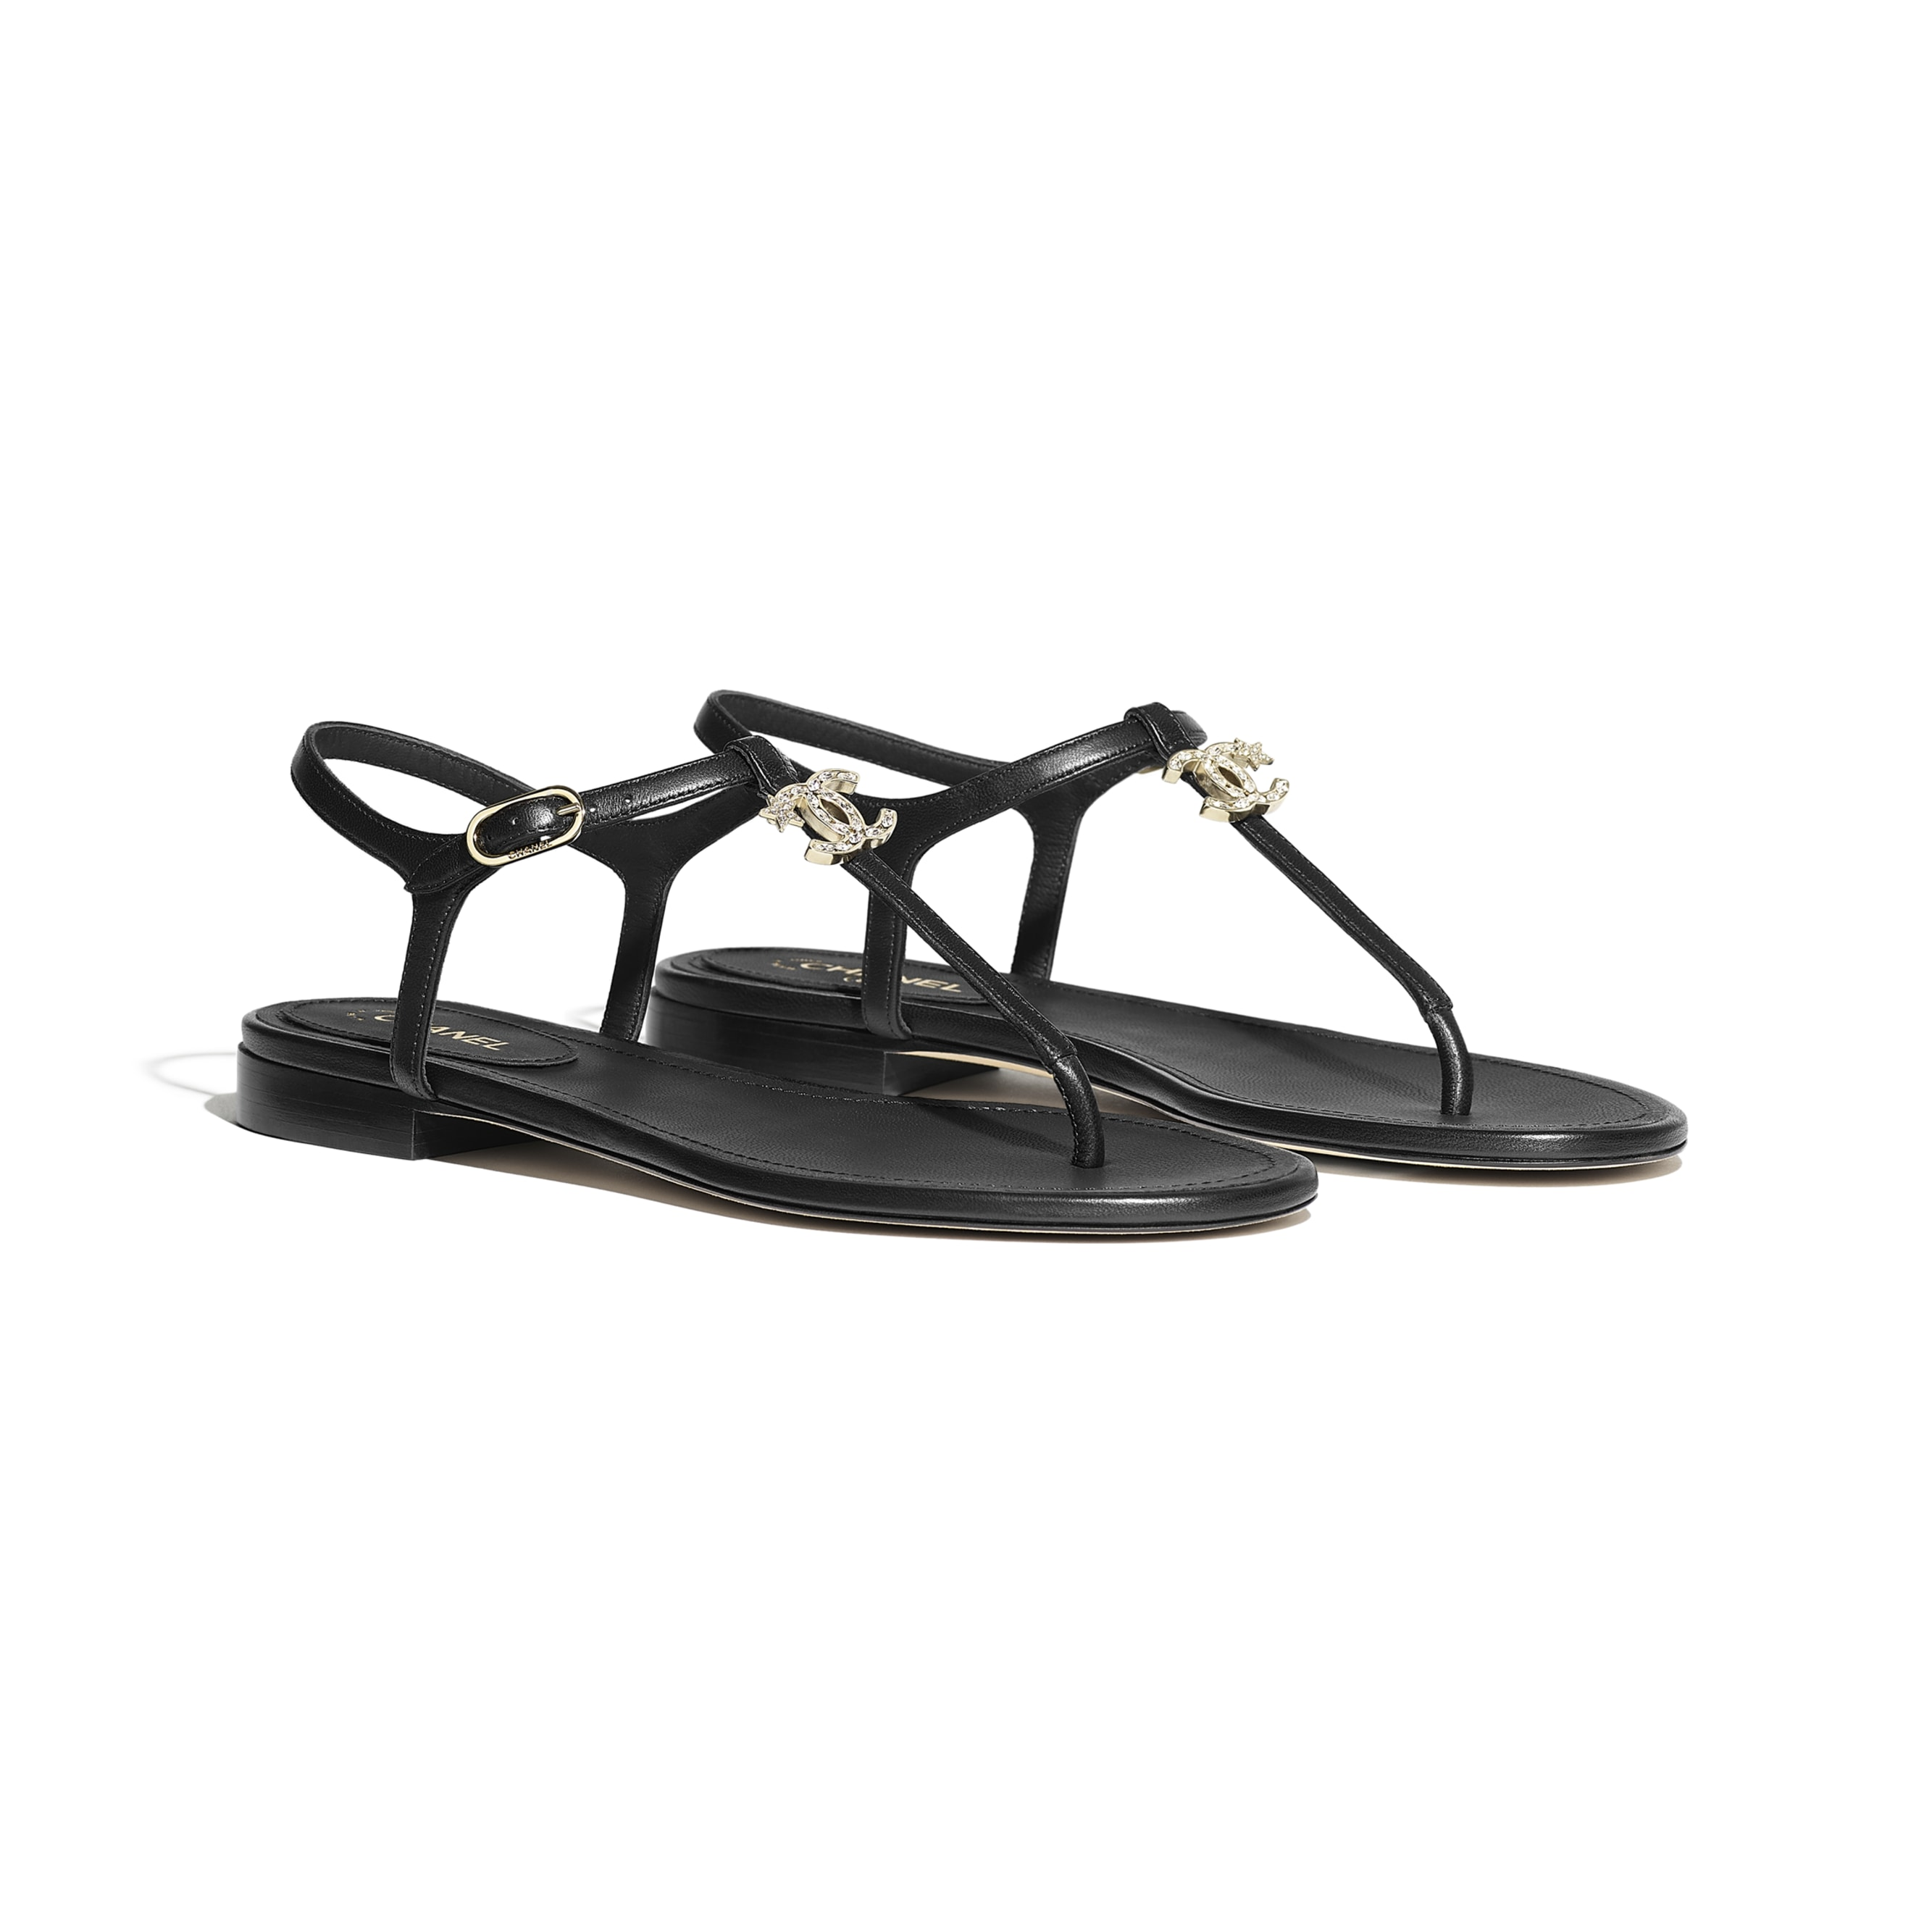 Sandals - Black - Lambskin - CHANEL - Alternative view - see standard sized version